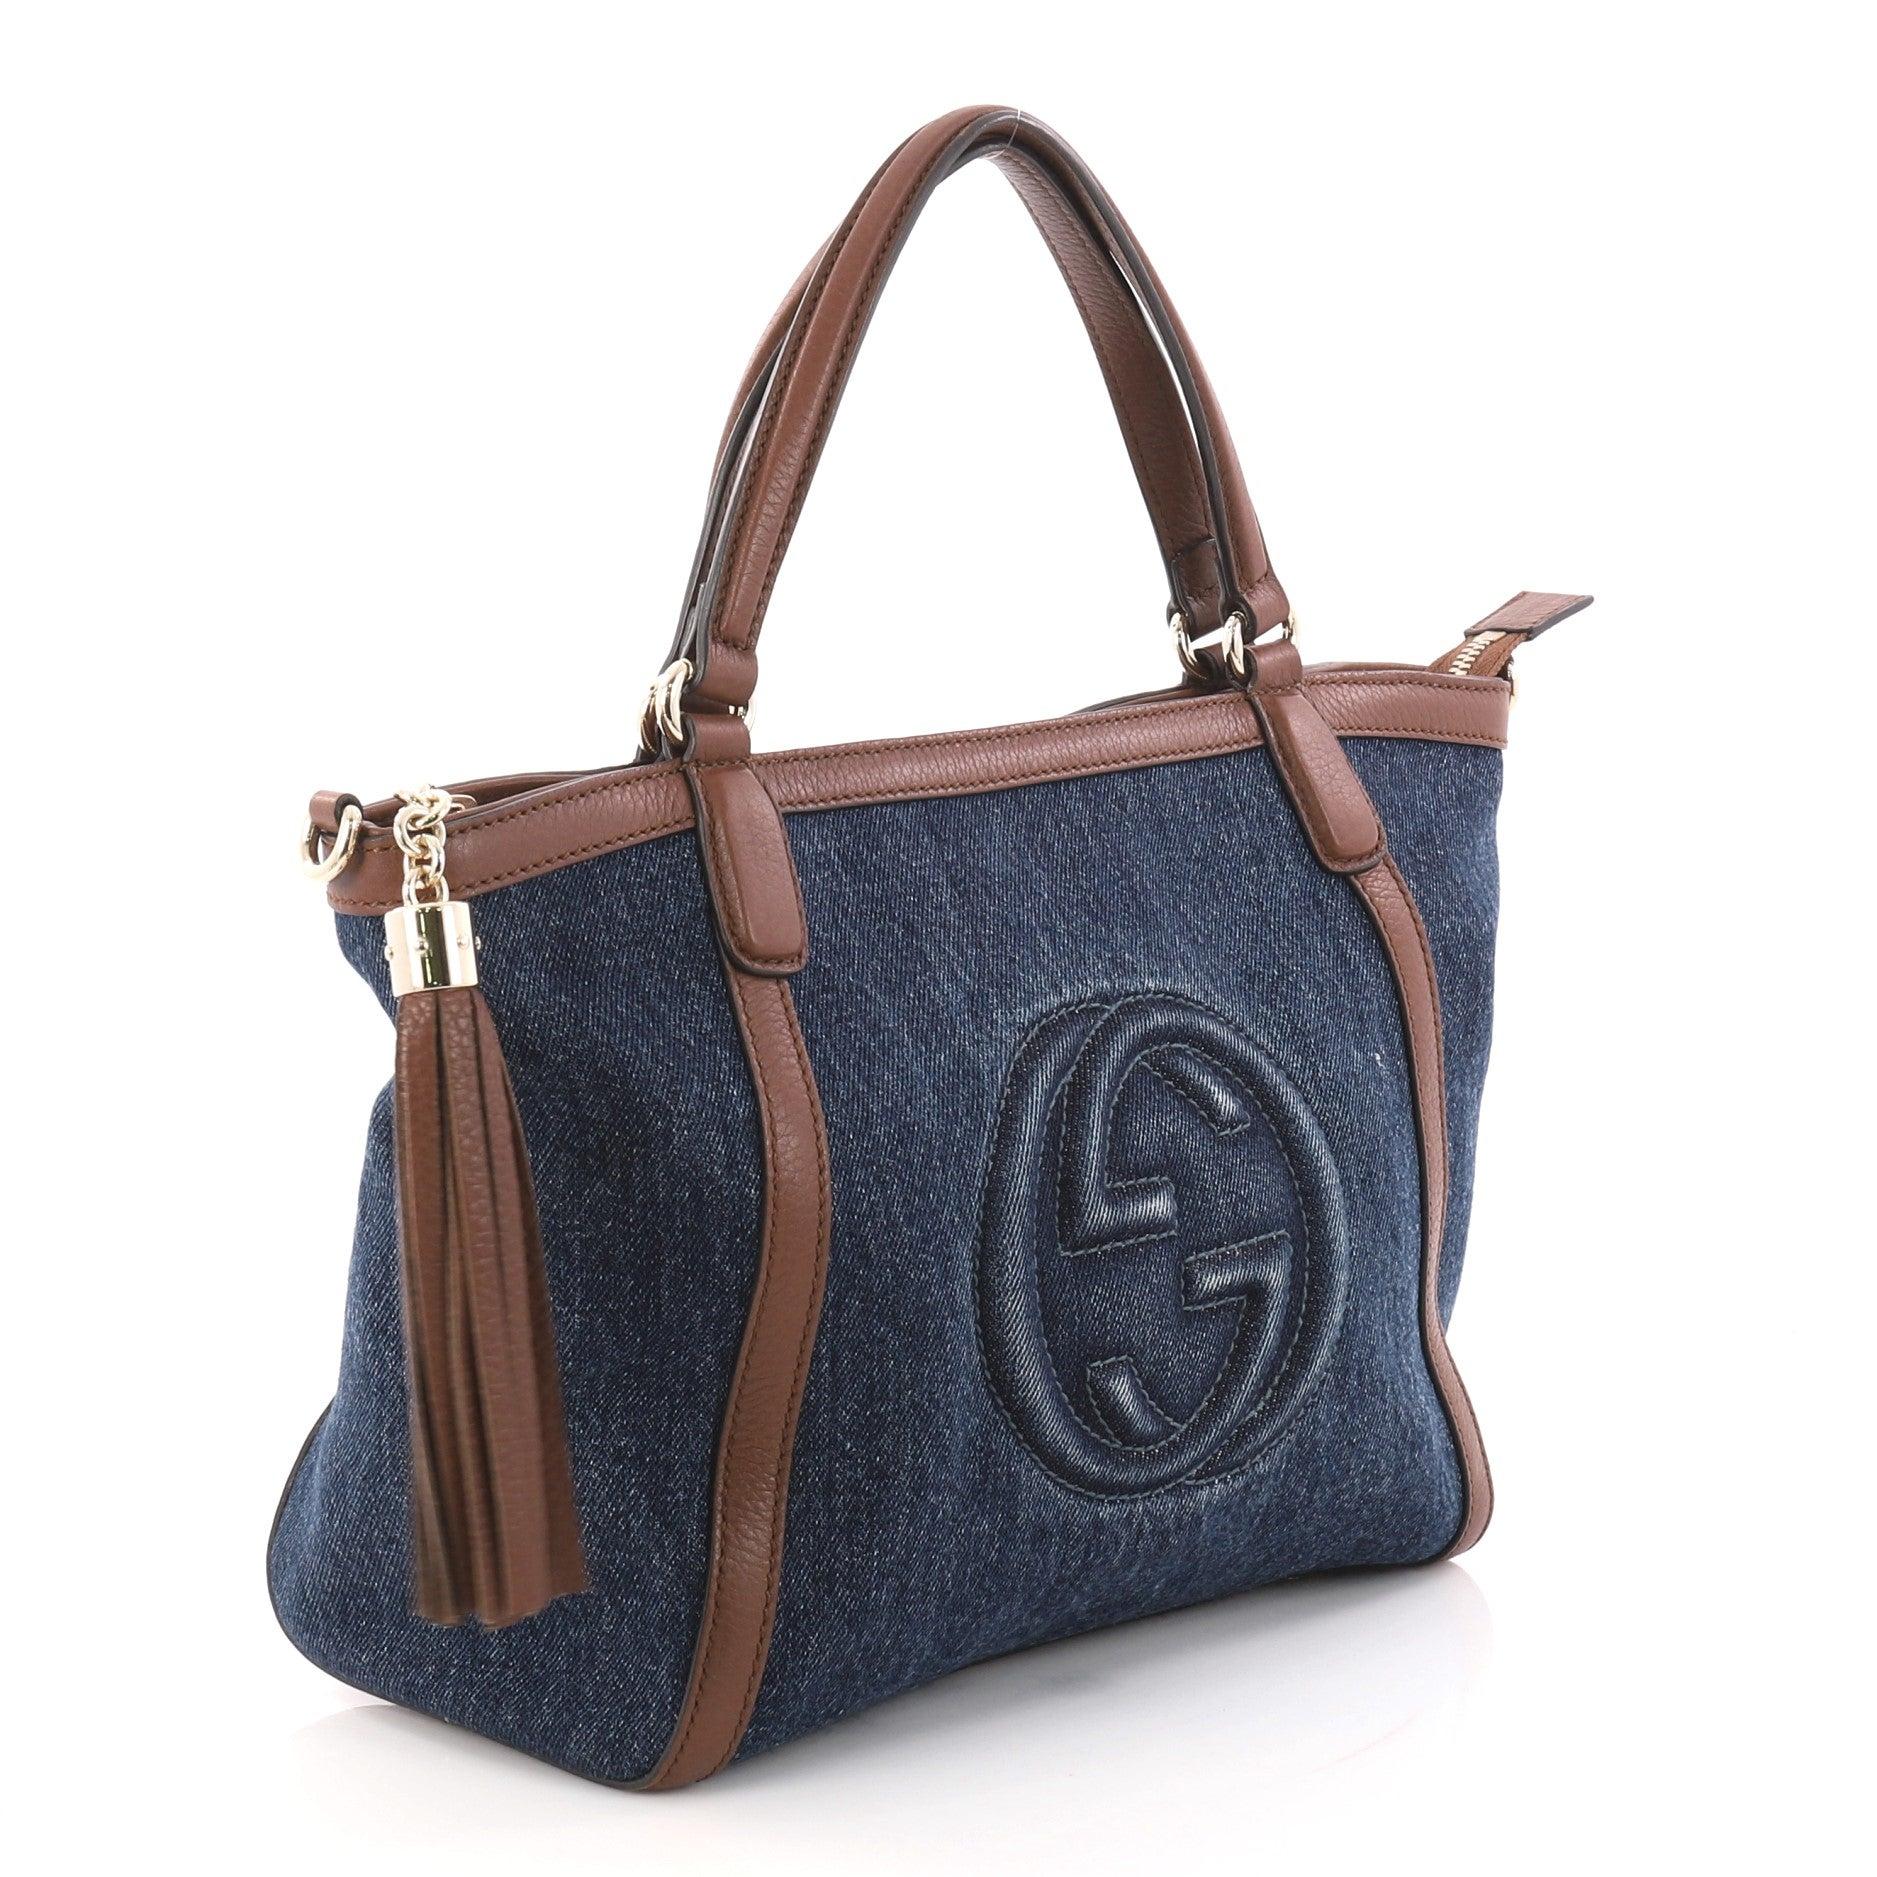 Gucci Soho Convertible Top Handle Bag Denim Small Rw5Hyh